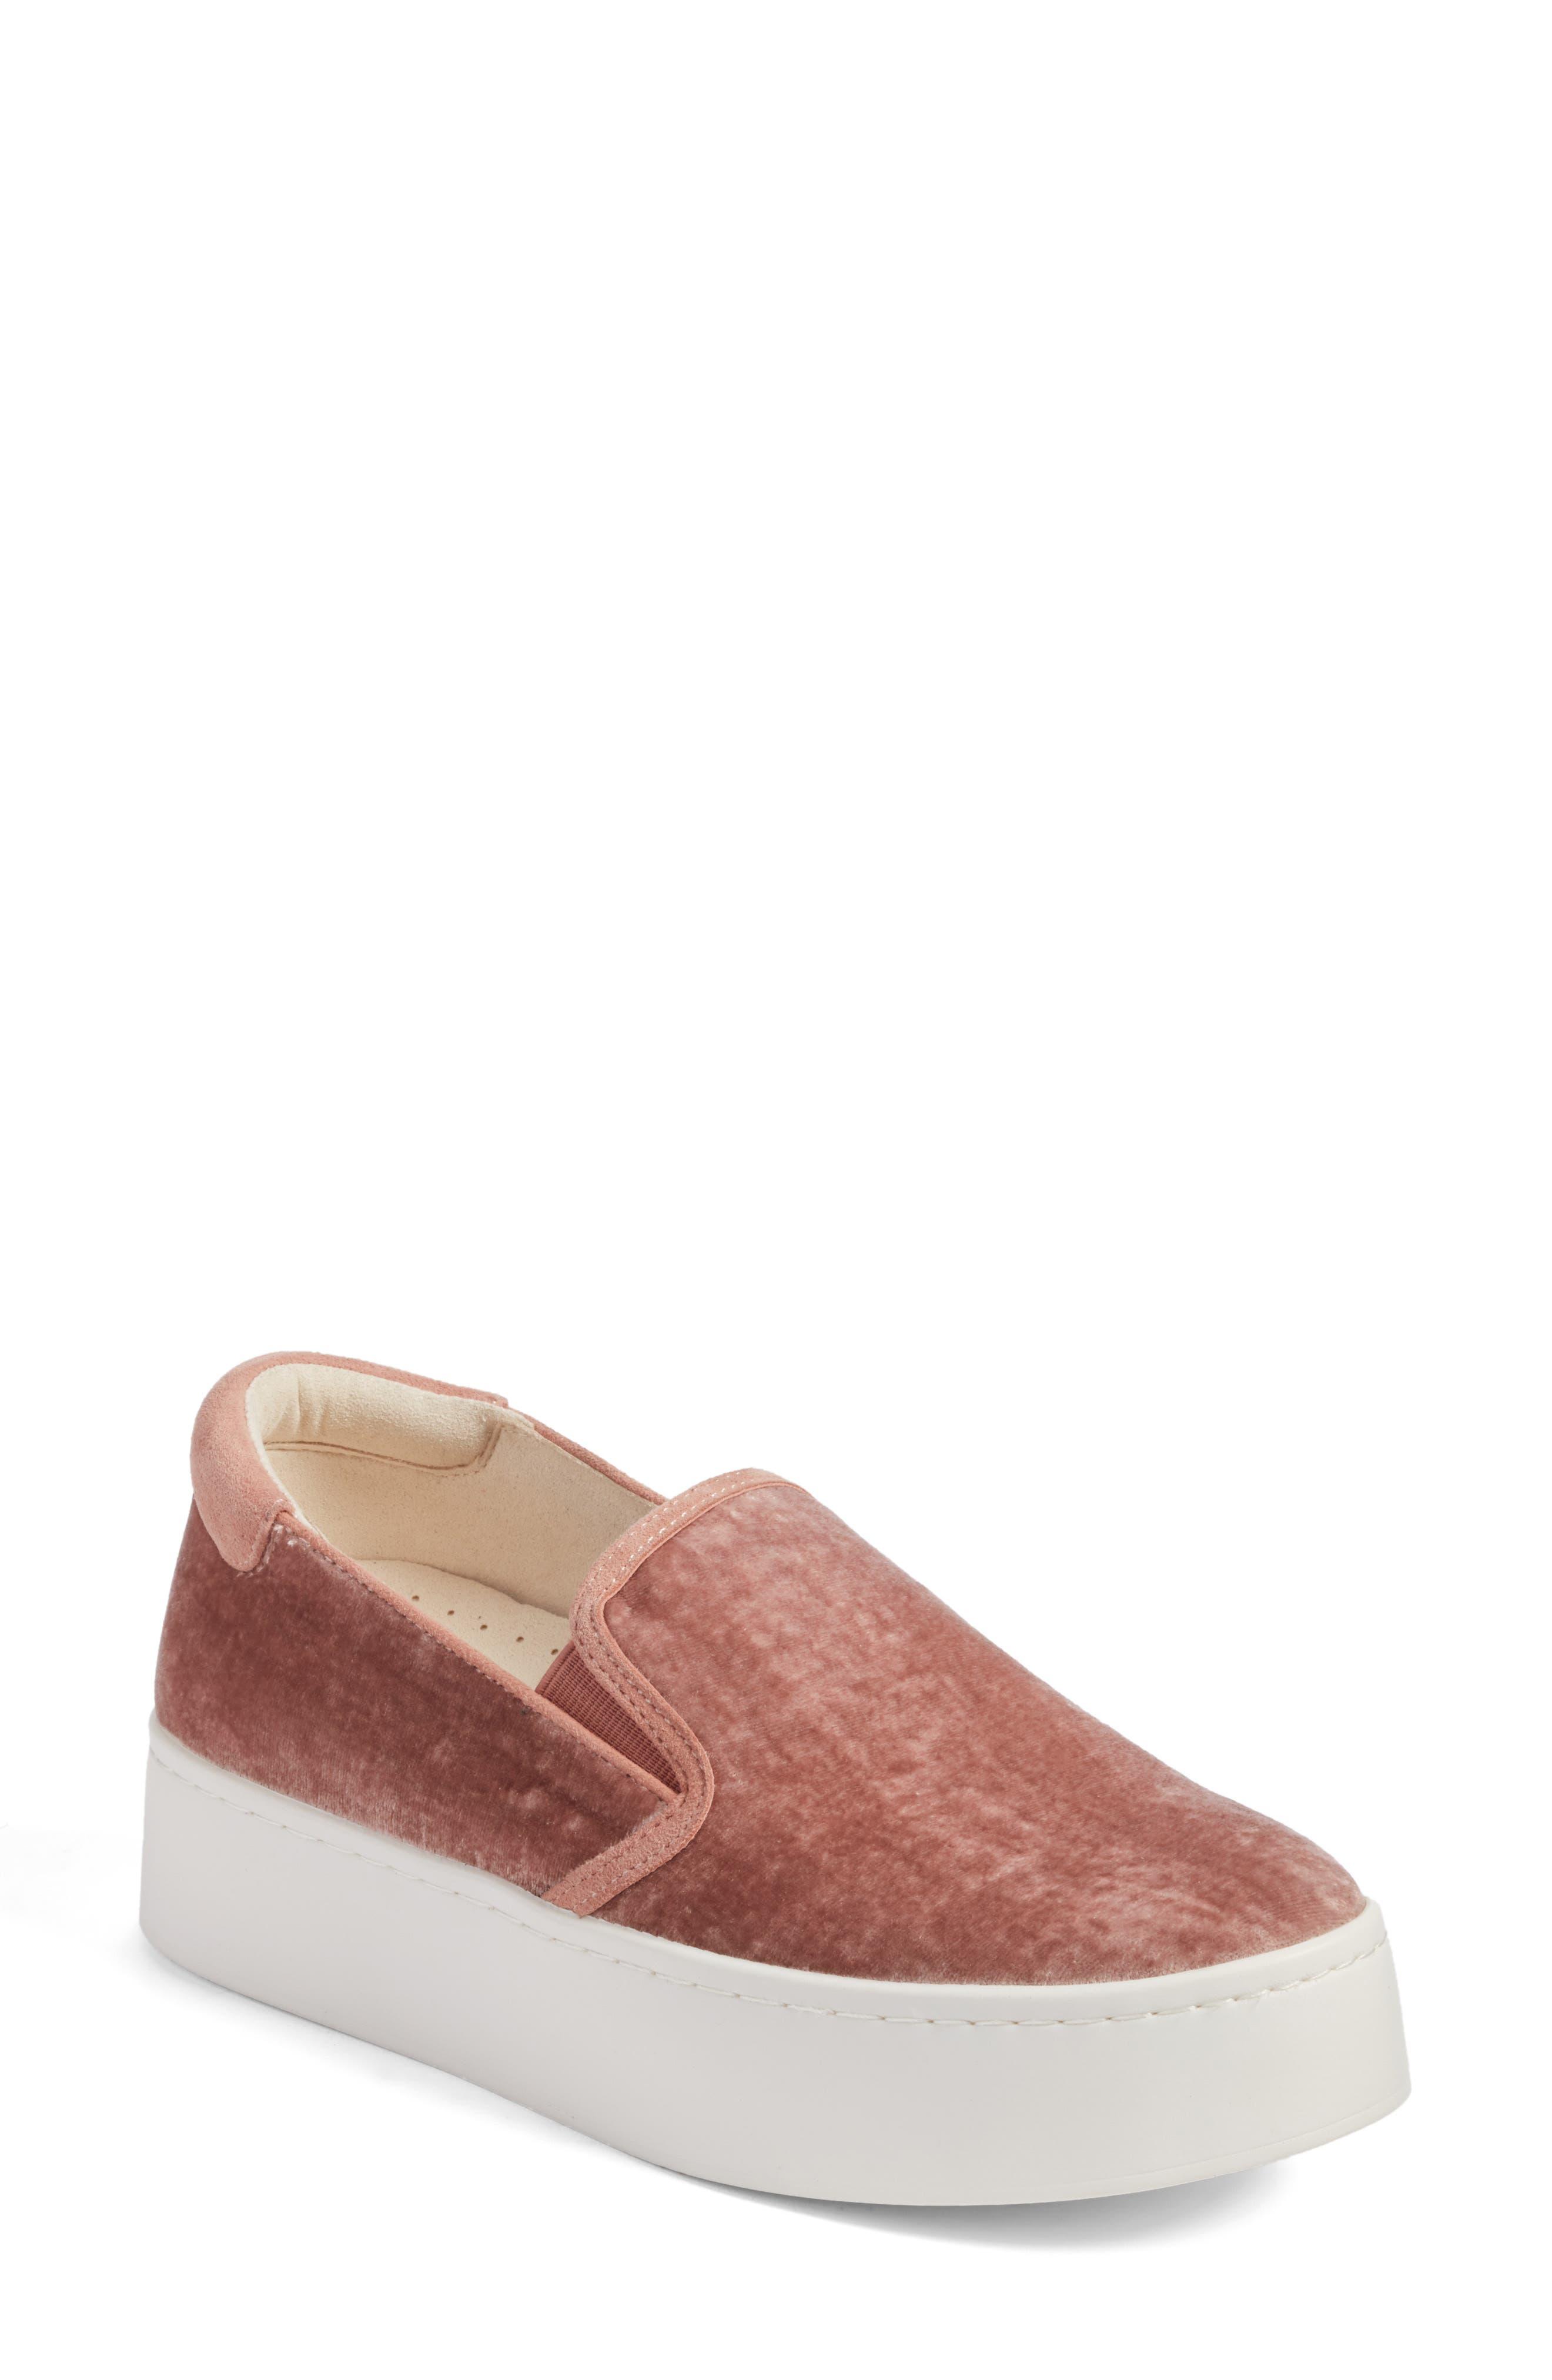 Joanie Slip-On Platform Sneaker,                             Main thumbnail 7, color,